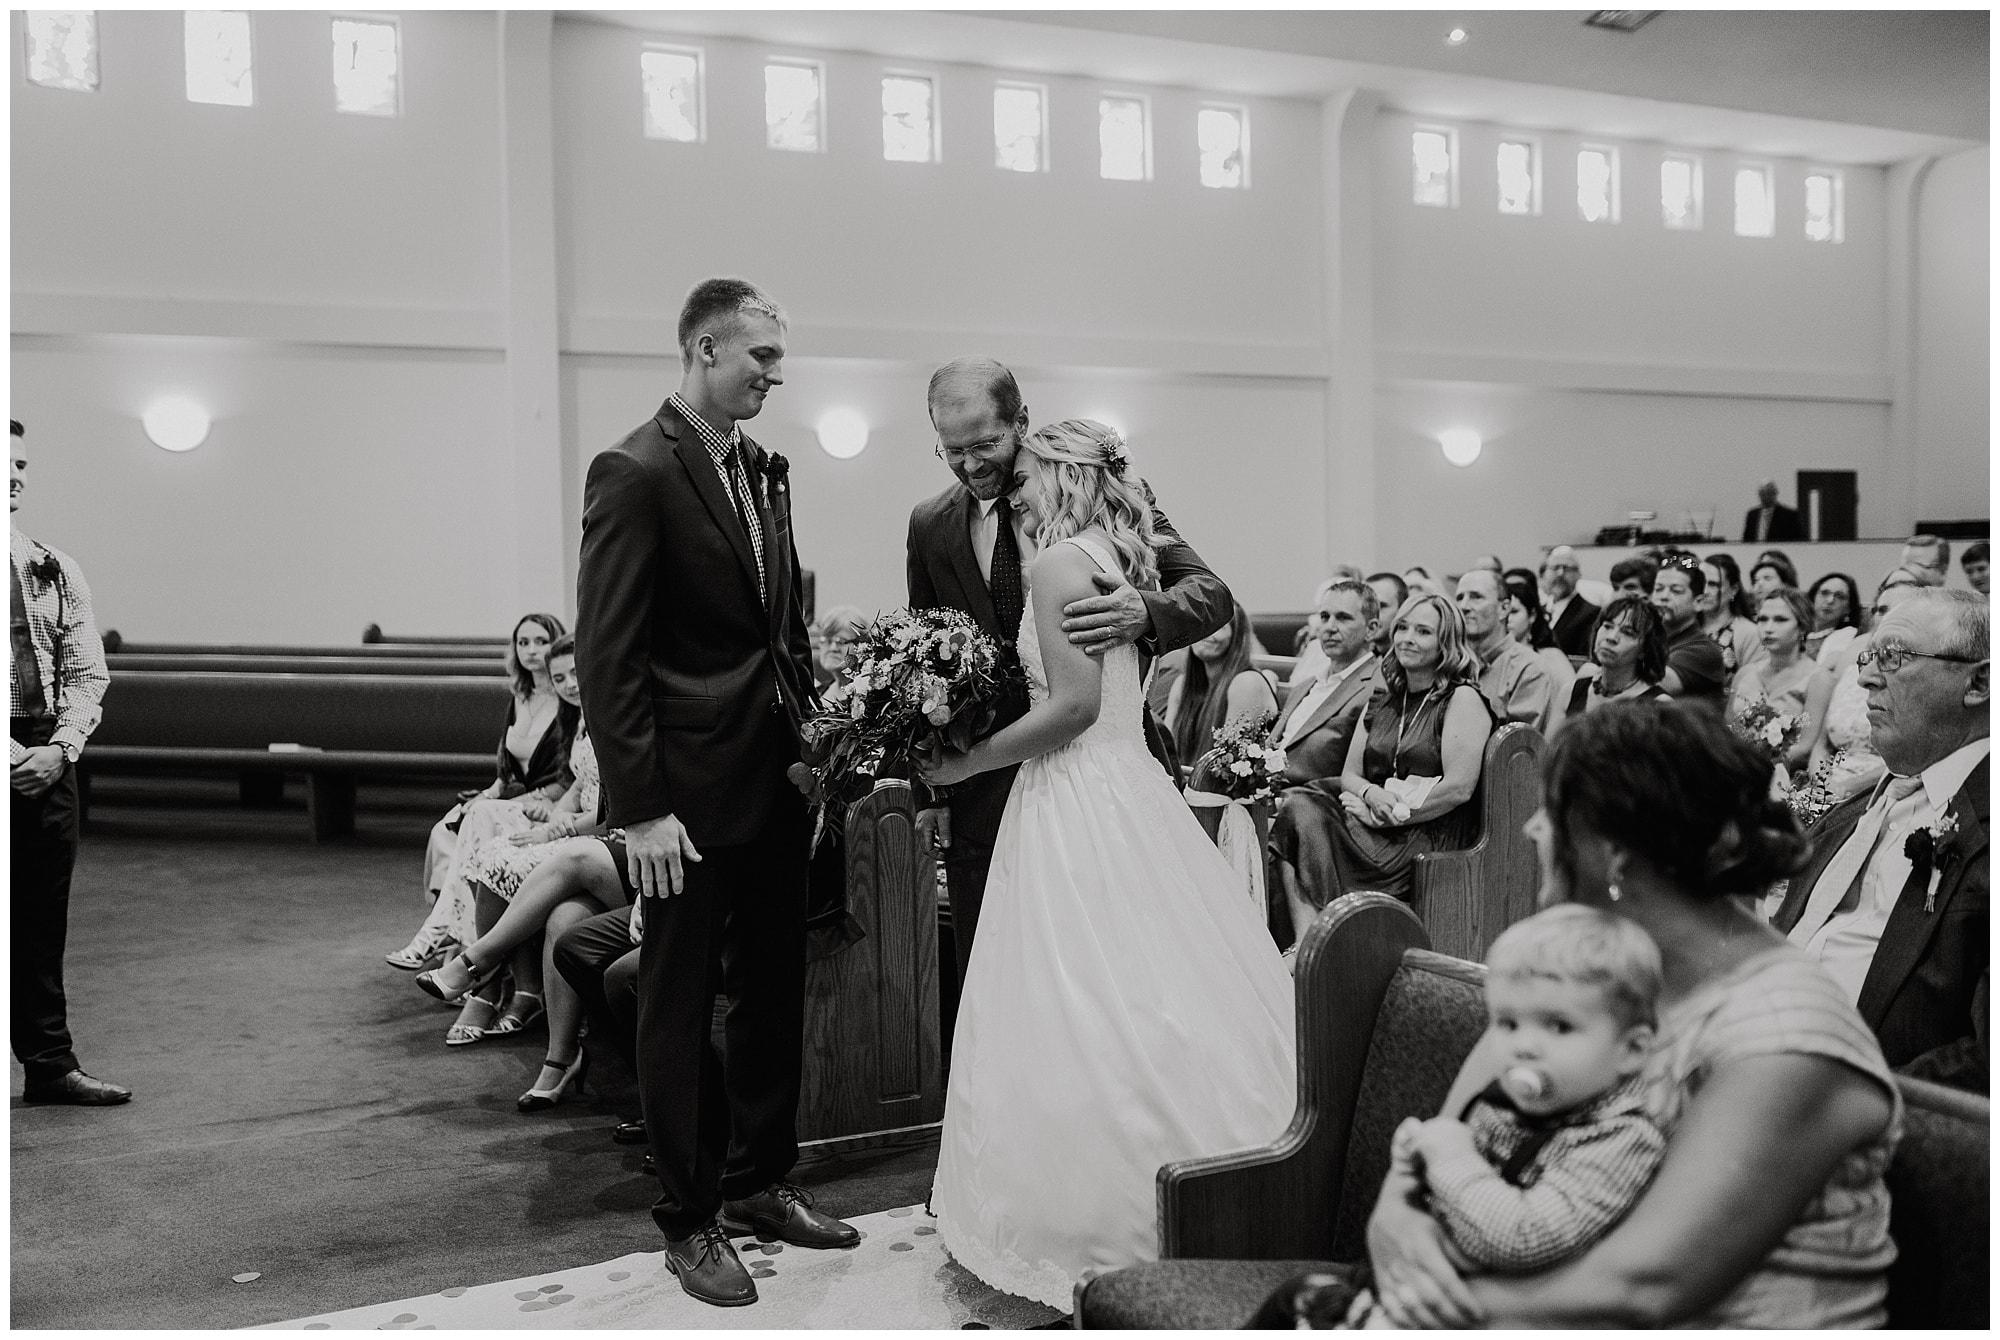 Adrian Michigan Wedding Photographer-34.JPG